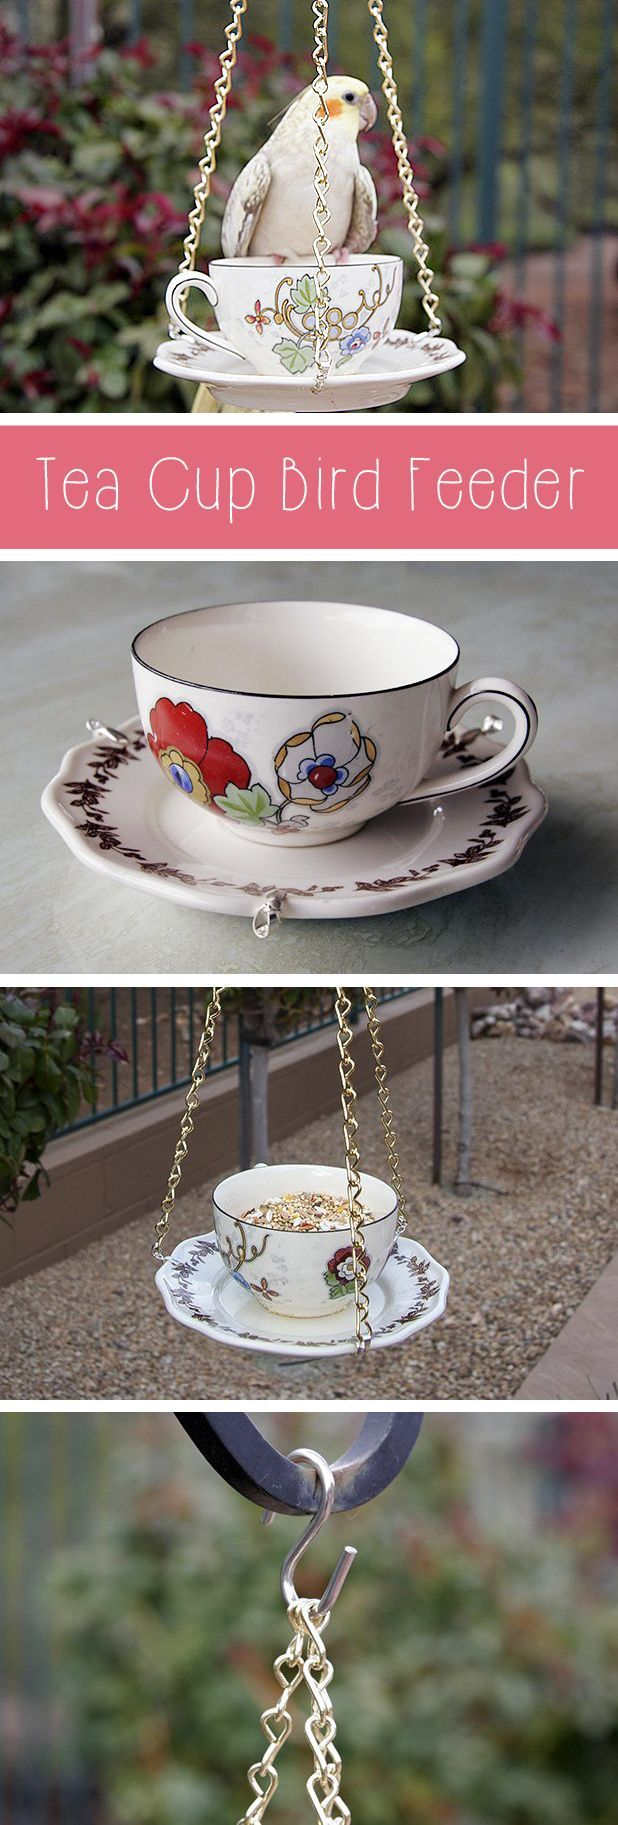 how to make a tea cup bird feeder simple diy bird feeder and inline